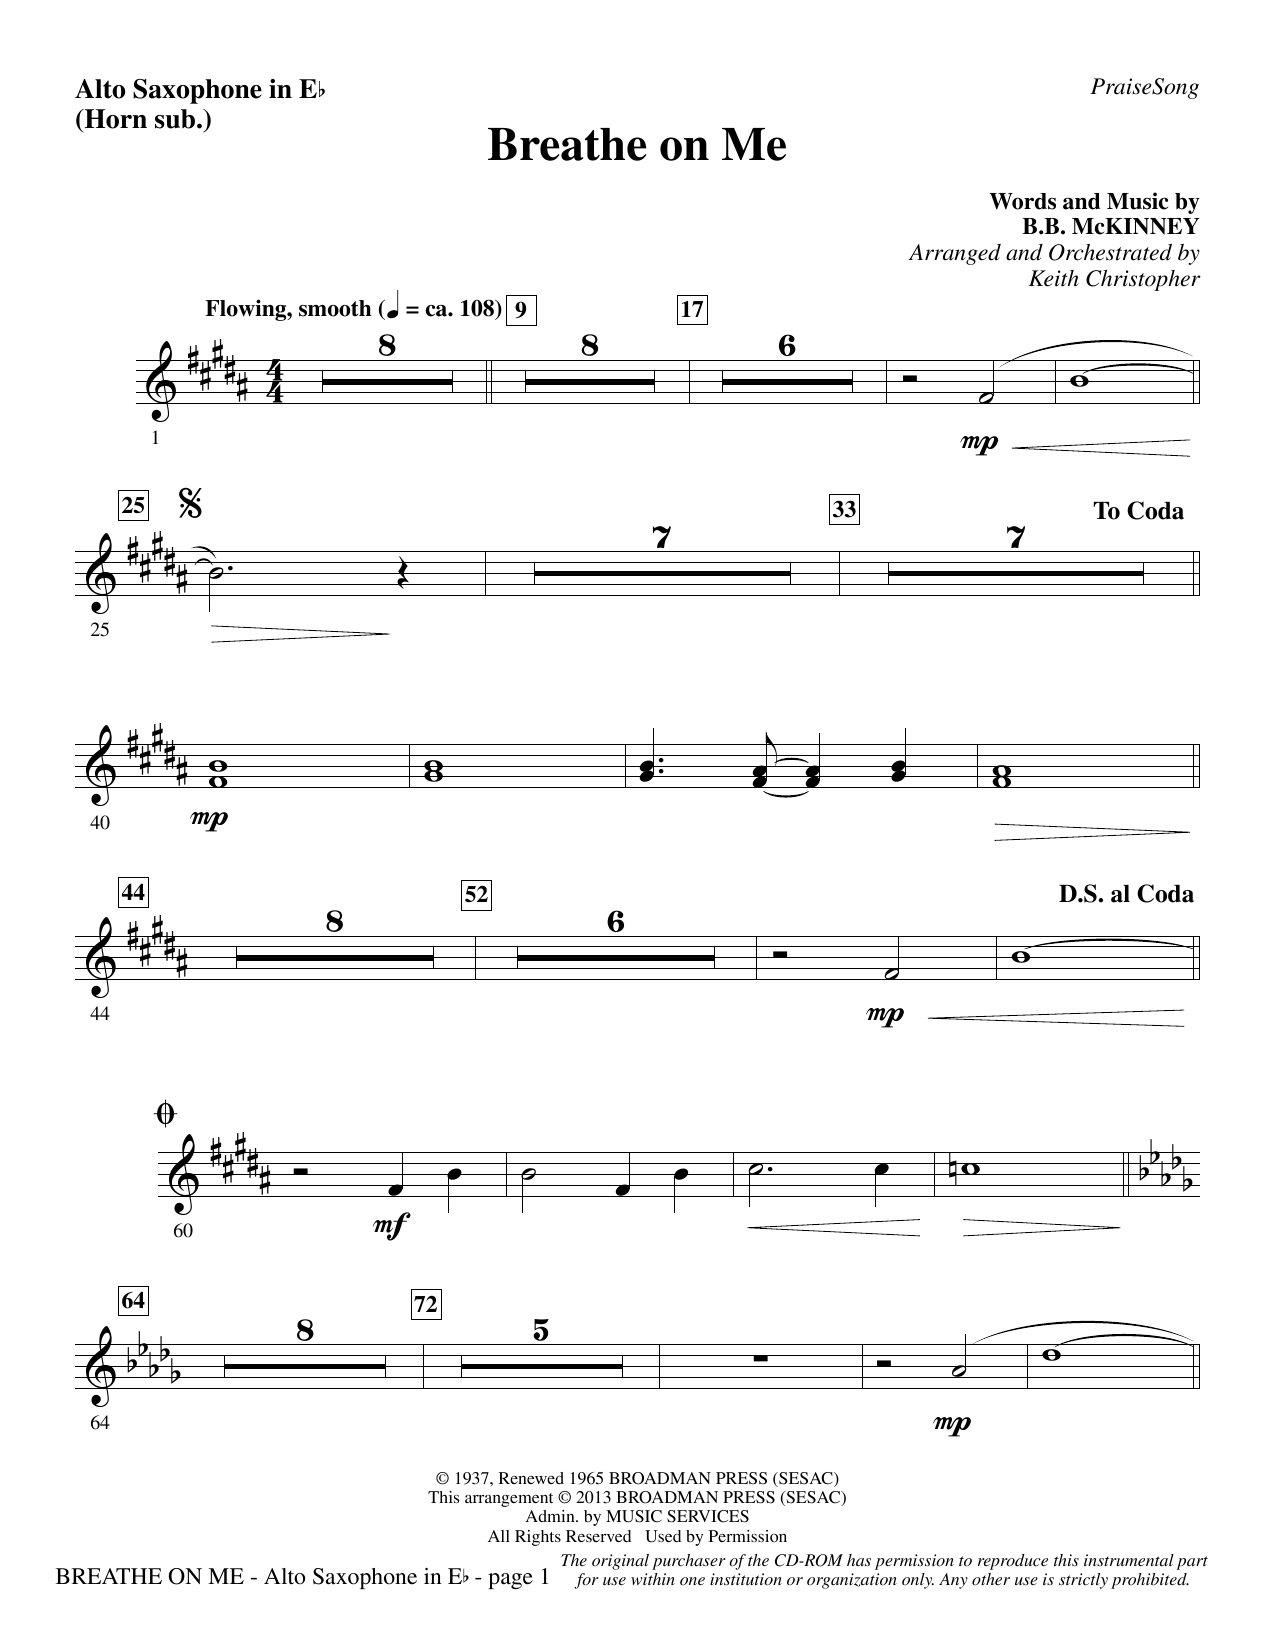 Breathe on Me - Alto Sax (sub. Horn) Sheet Music